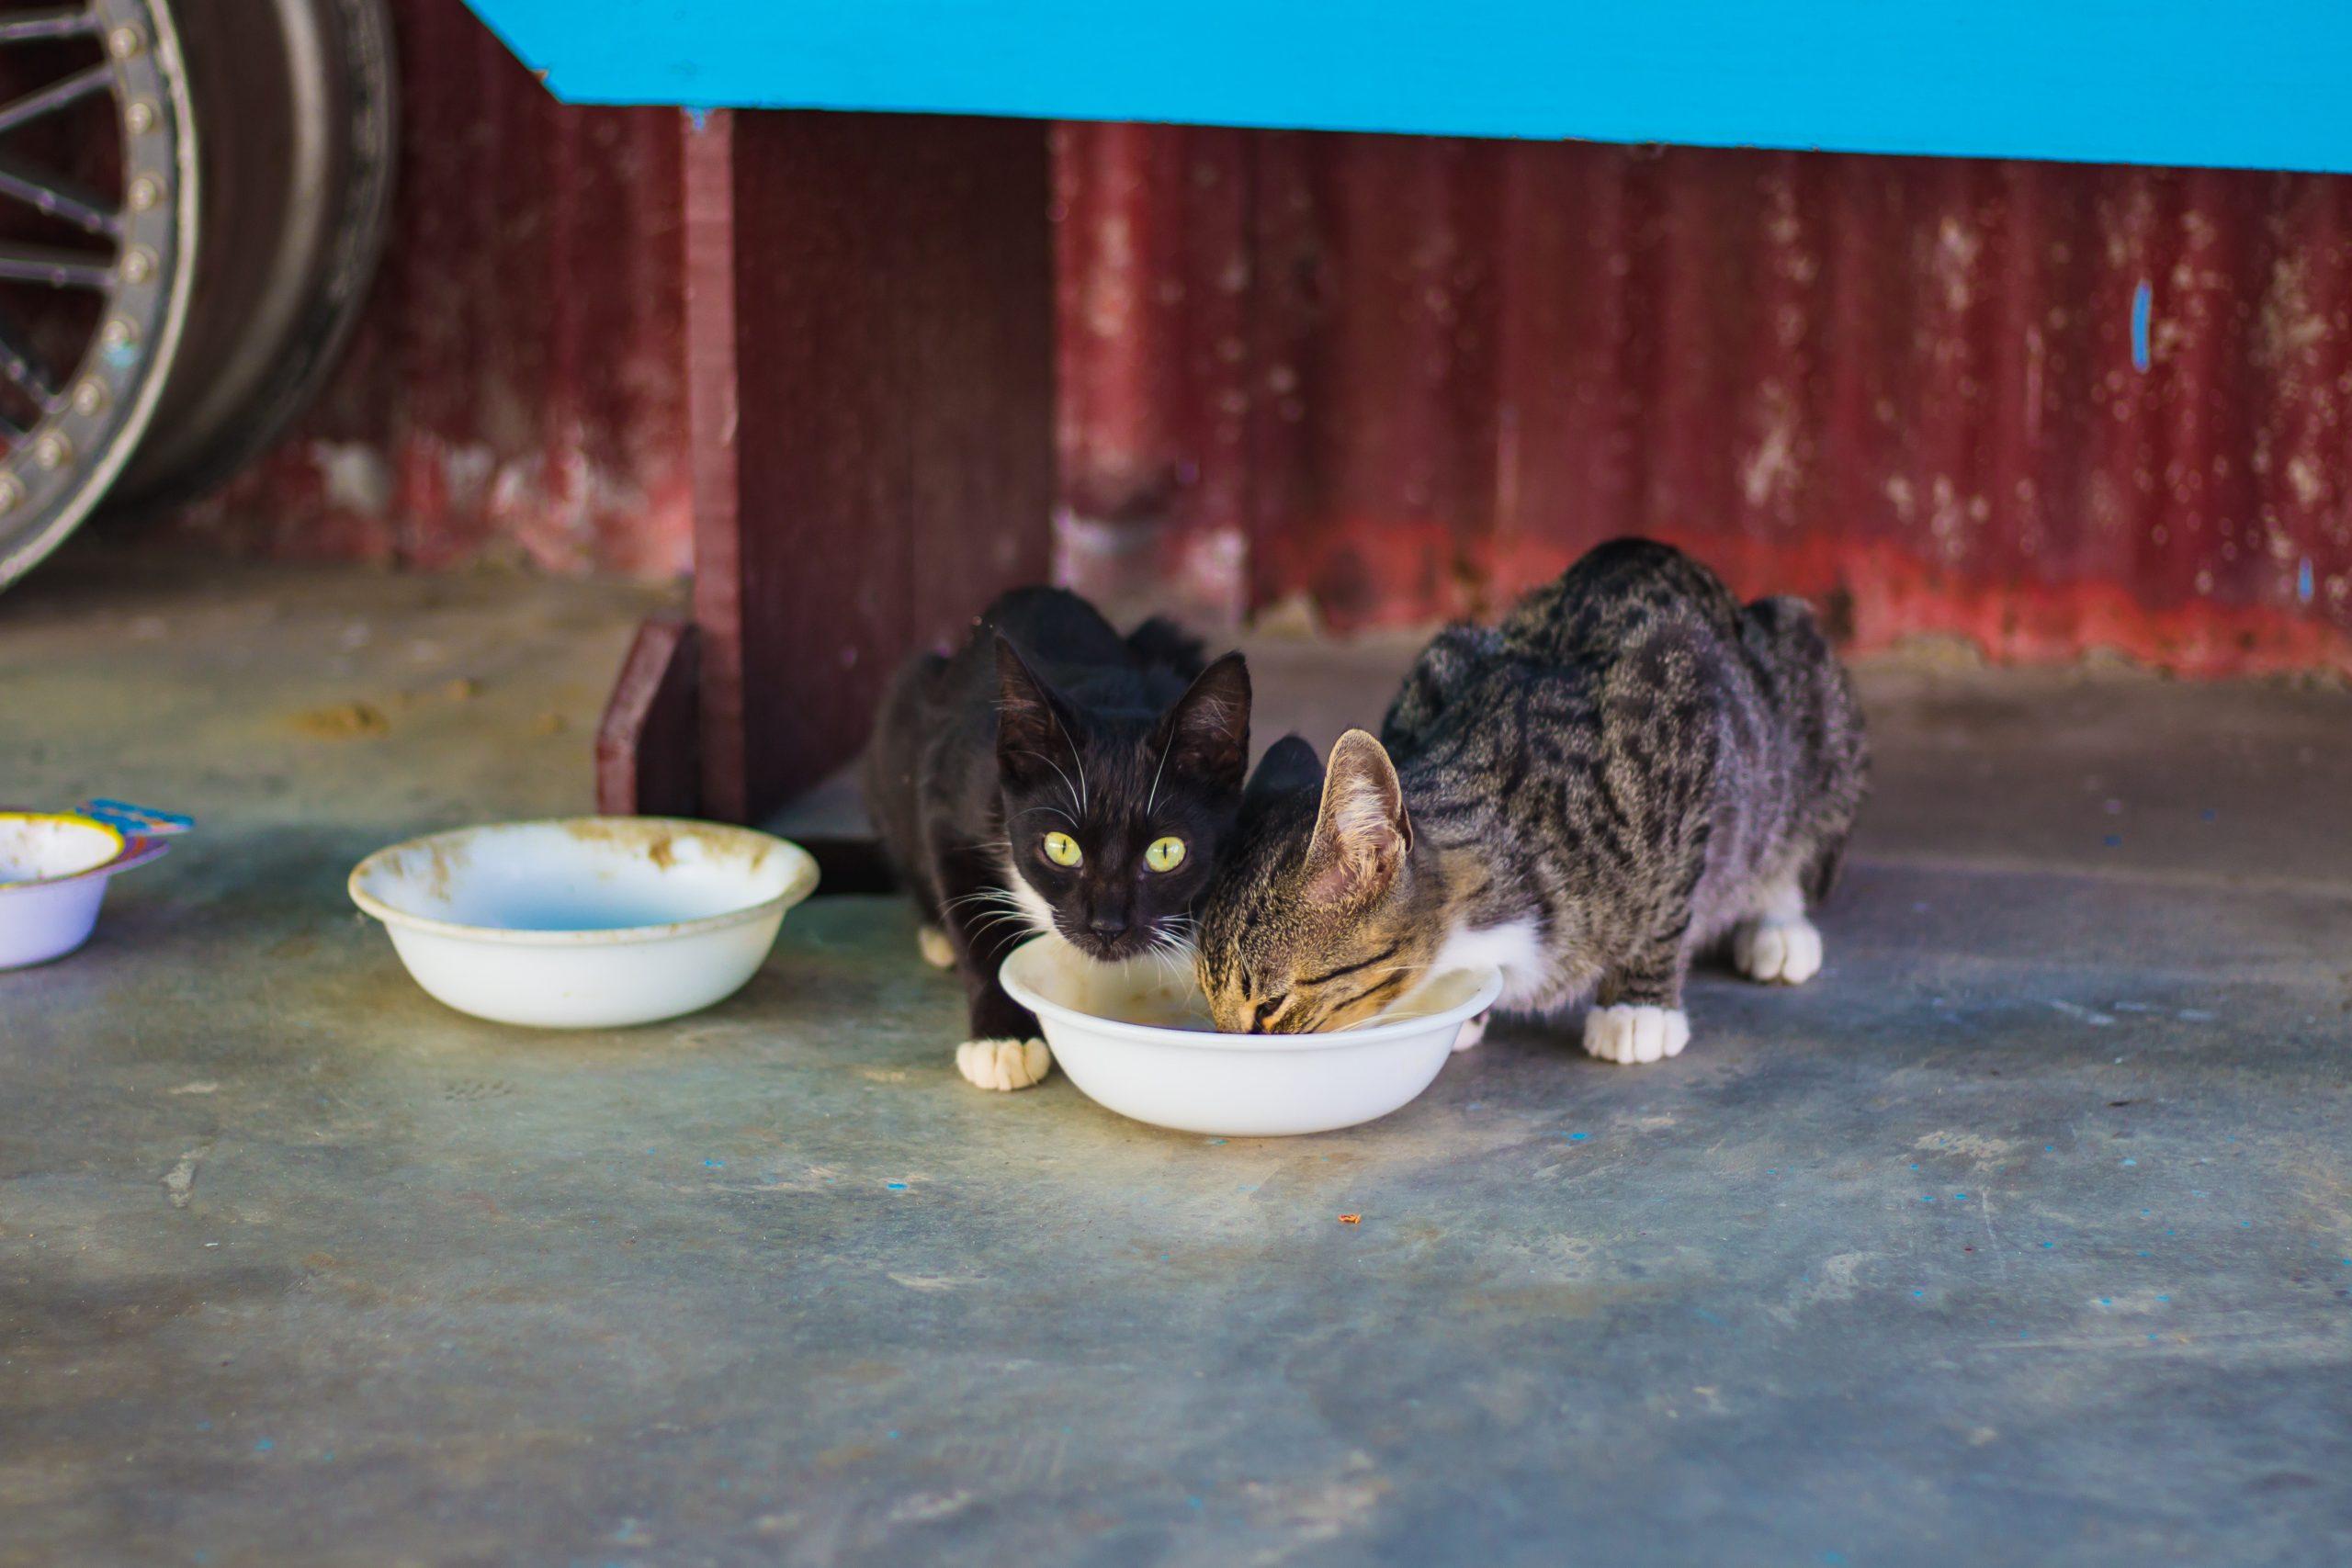 kittens eating food